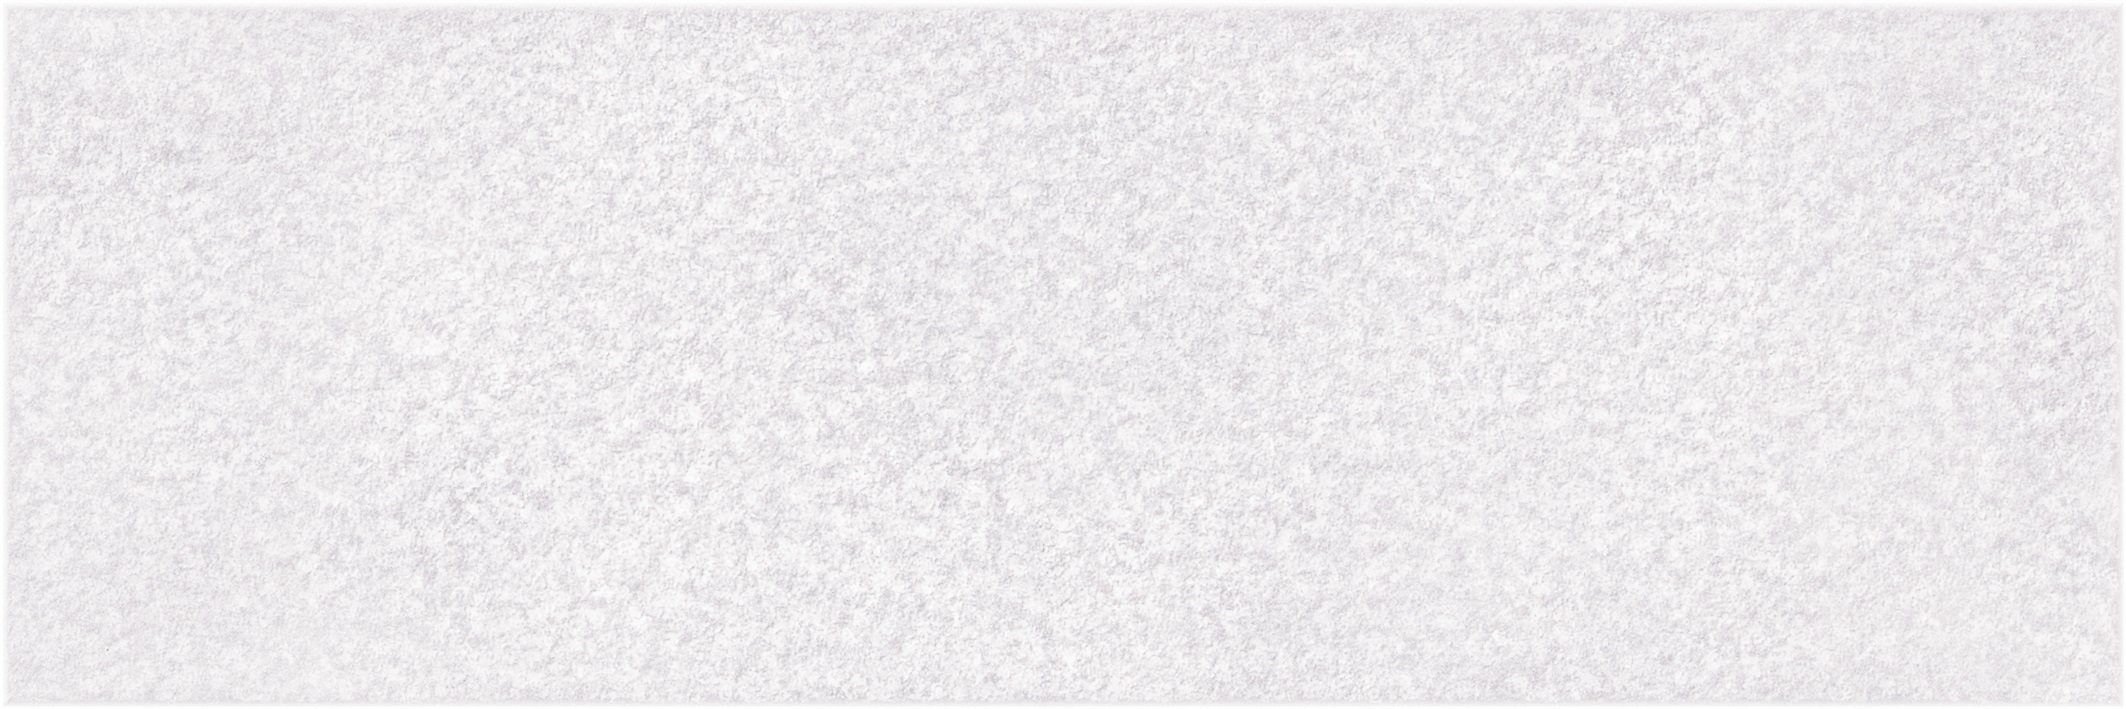 Adda perla 20x60x0,83 - Hansas Plaadimaailm